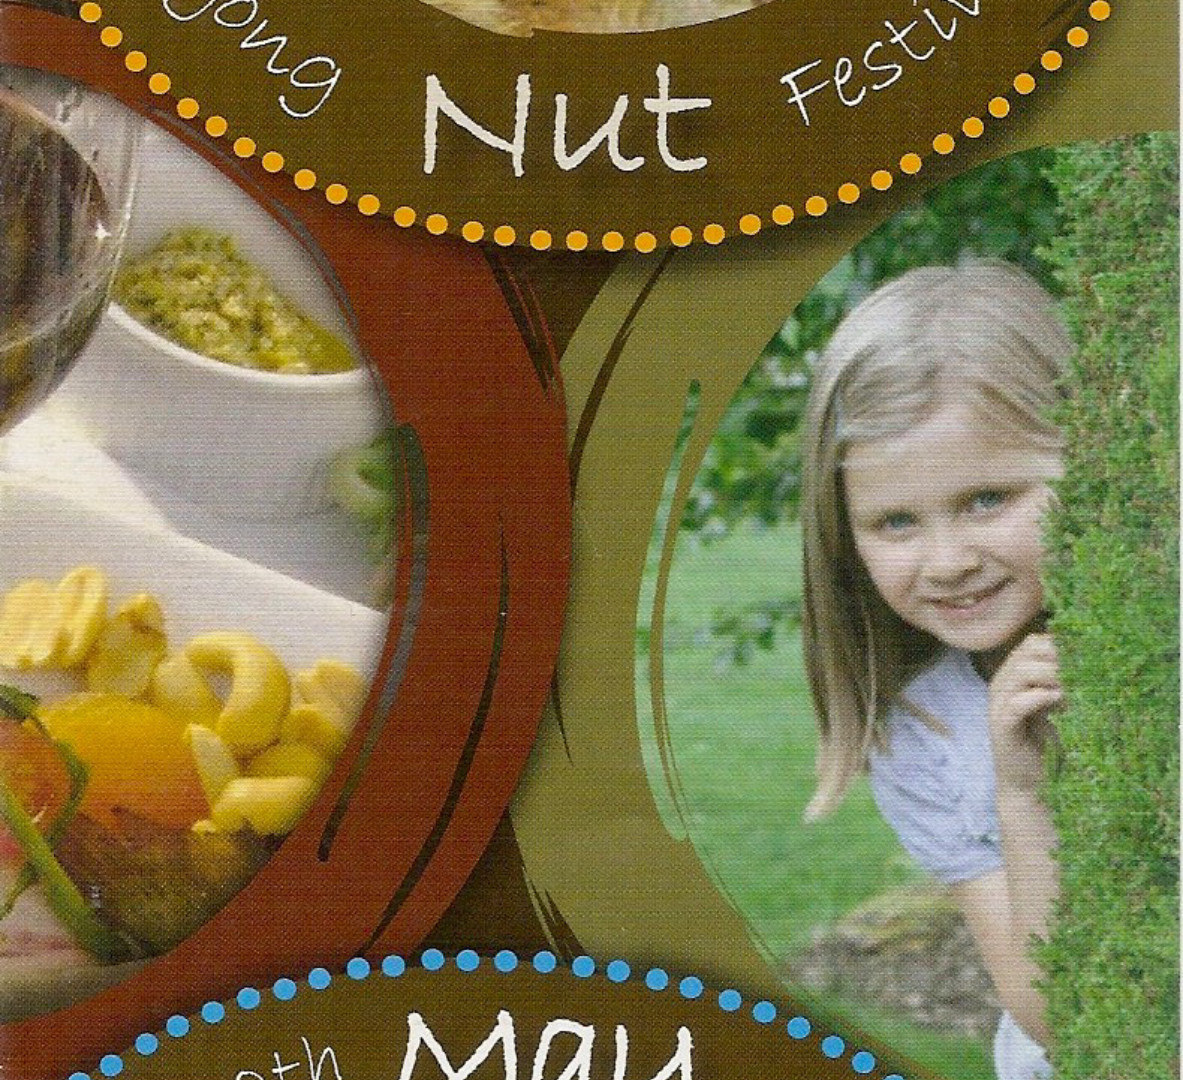 Wandi nut Festival Festival 2009 Program